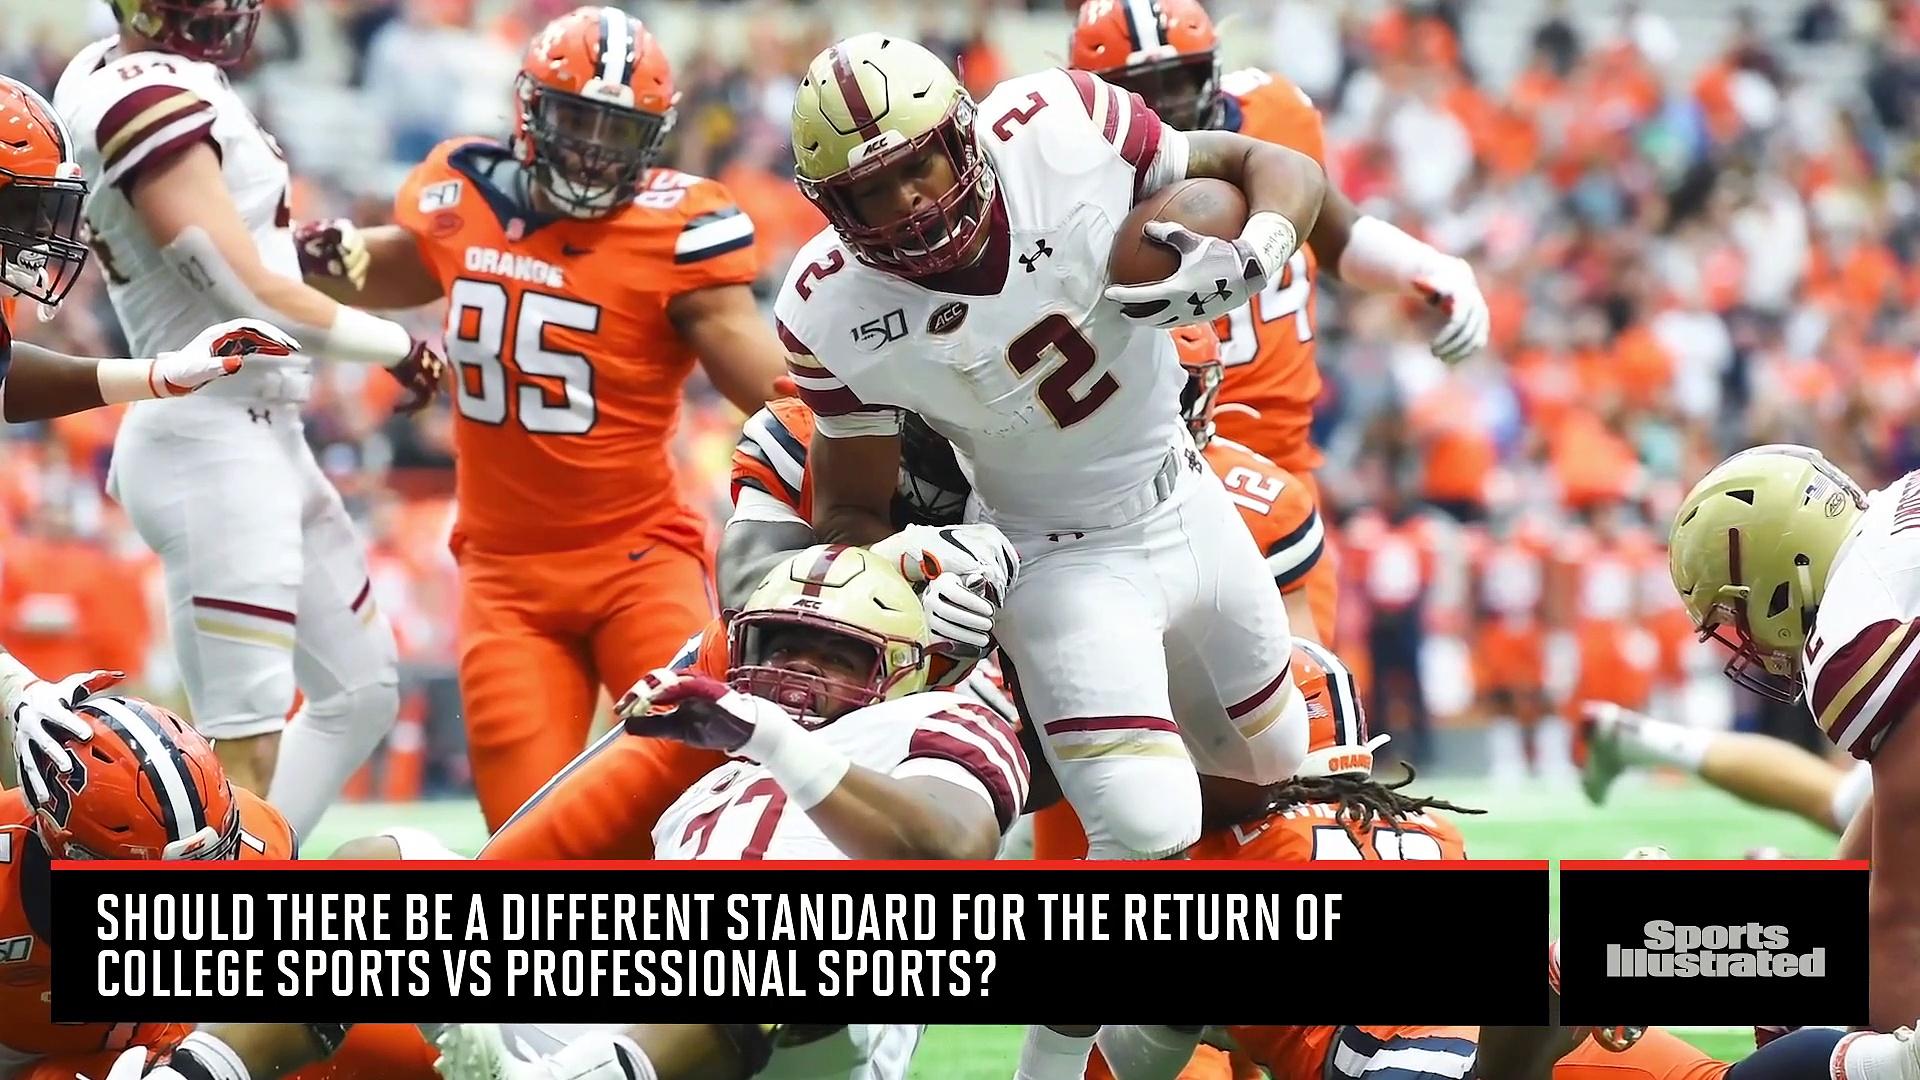 College Sports vs. Professional Sports Returning